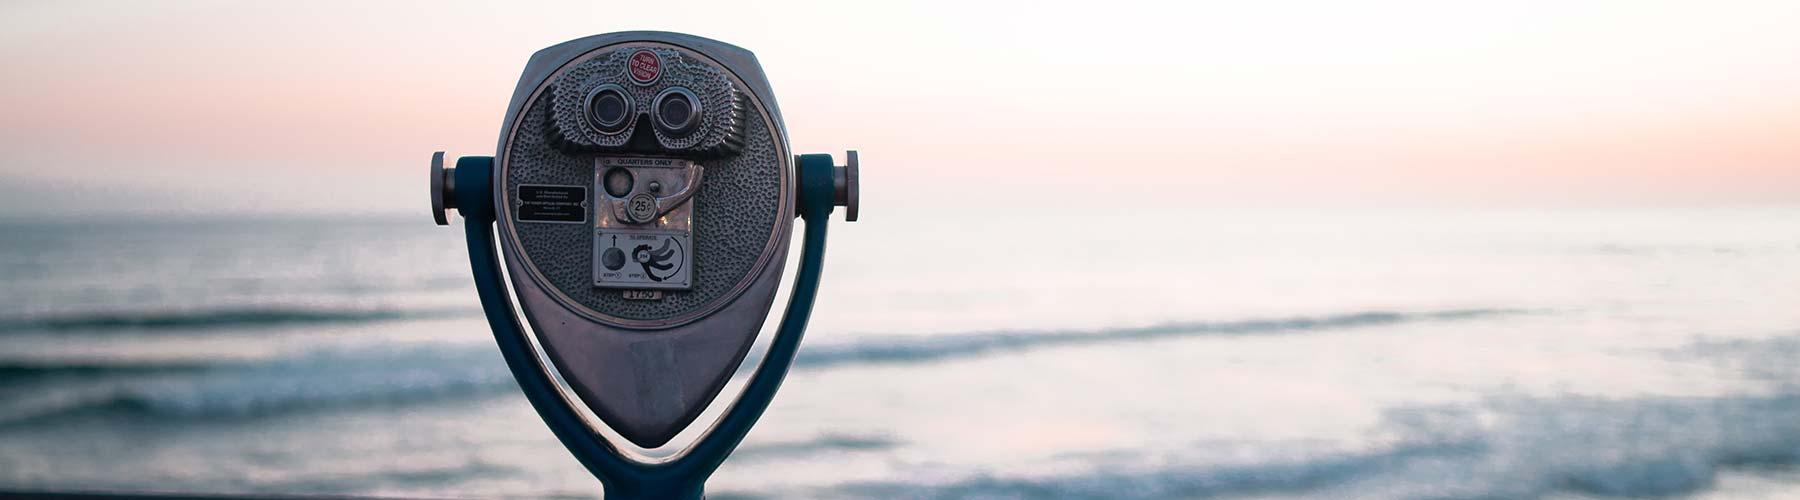 Binoculars looking to the sea